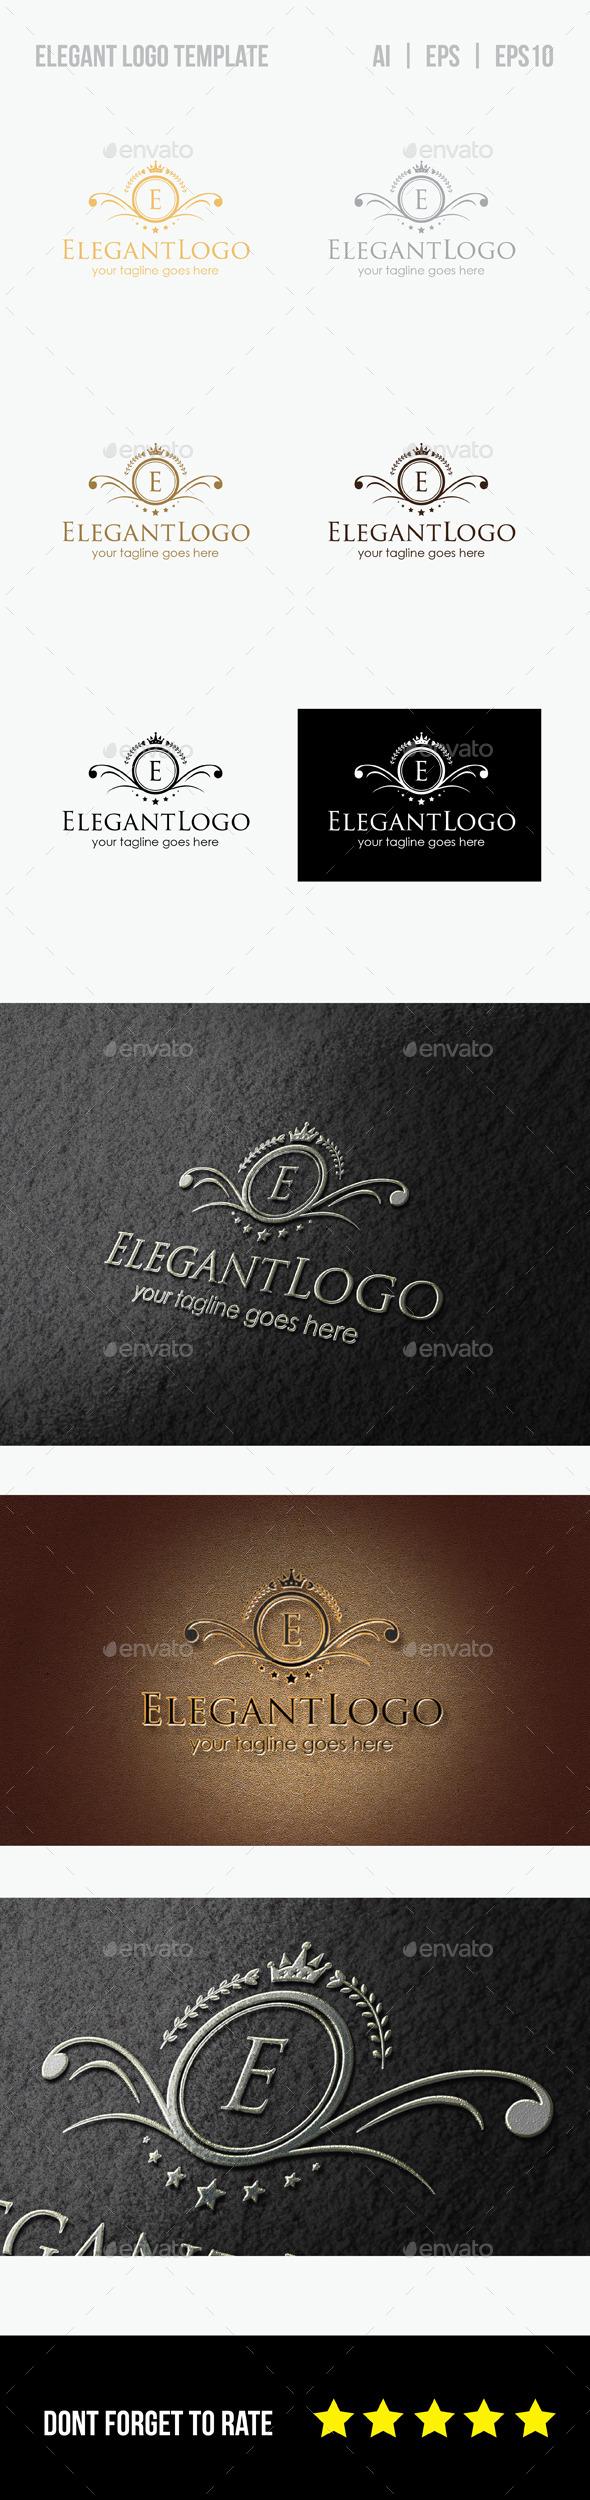 GraphicRiver Elegant Logo Template 8804319